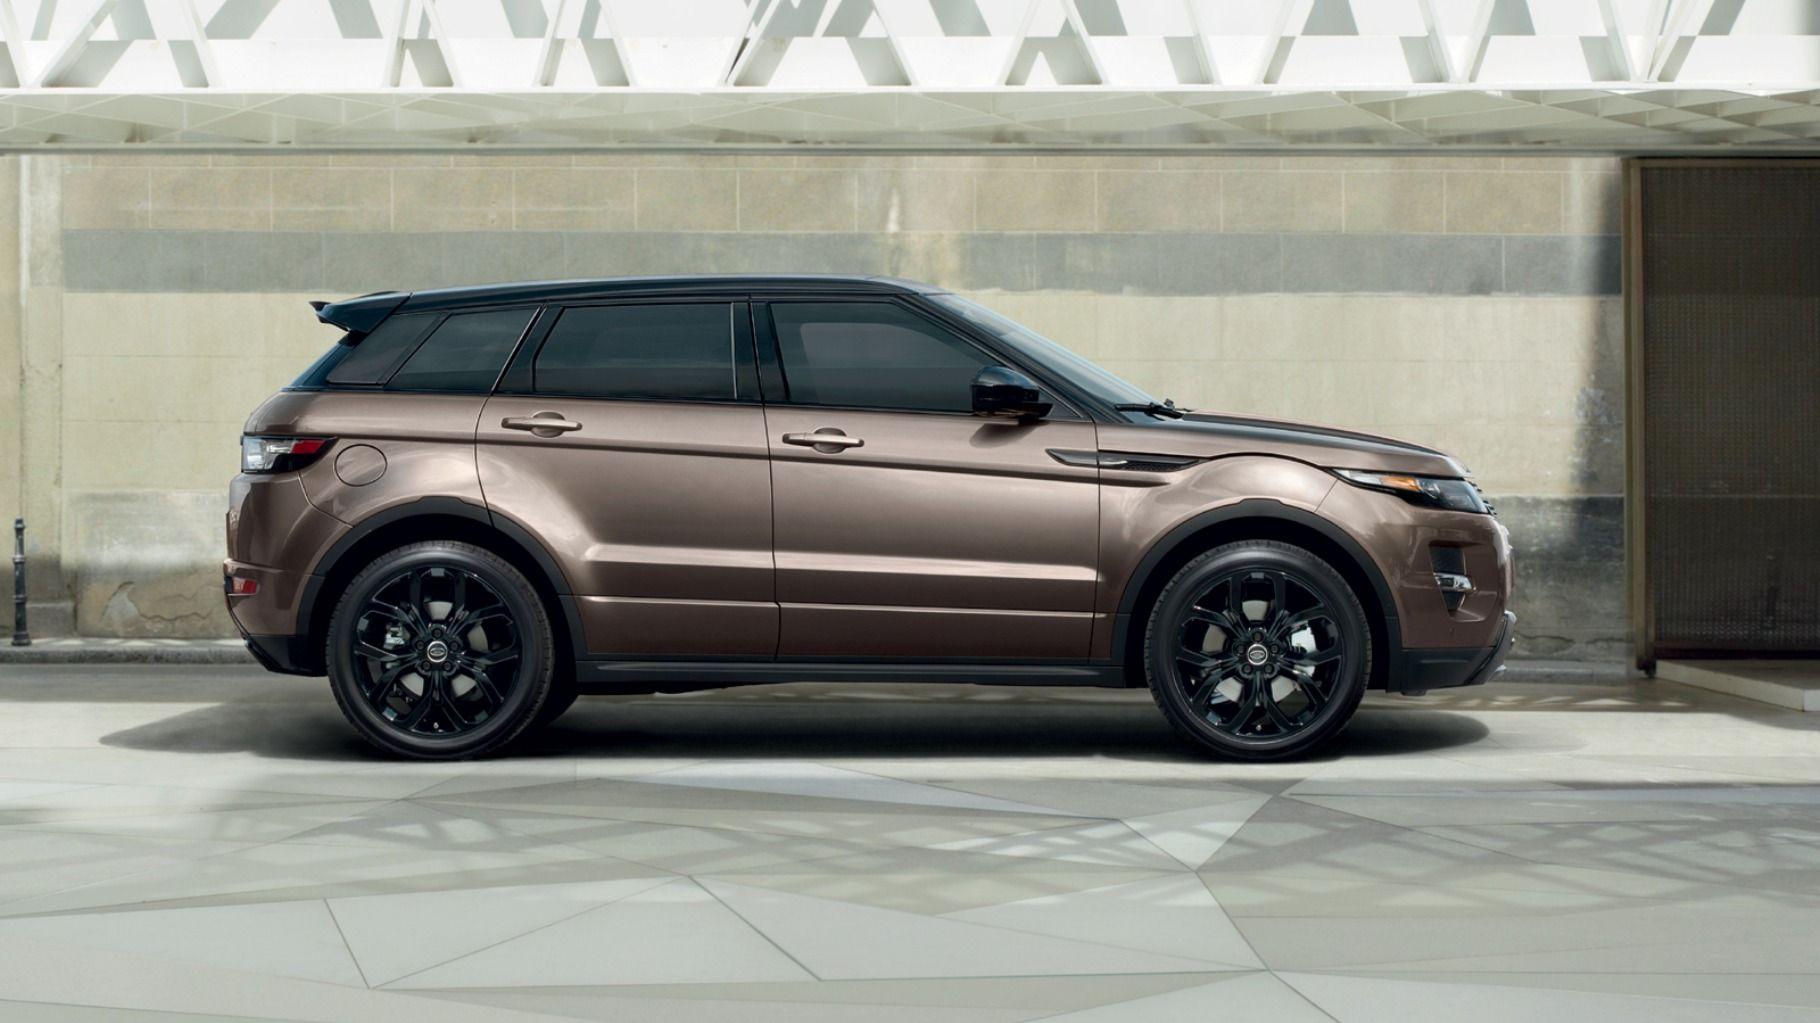 Used Range Rovers >> Range Rover Evoque Bronze | www.pixshark.com - Images Galleries With A Bite!